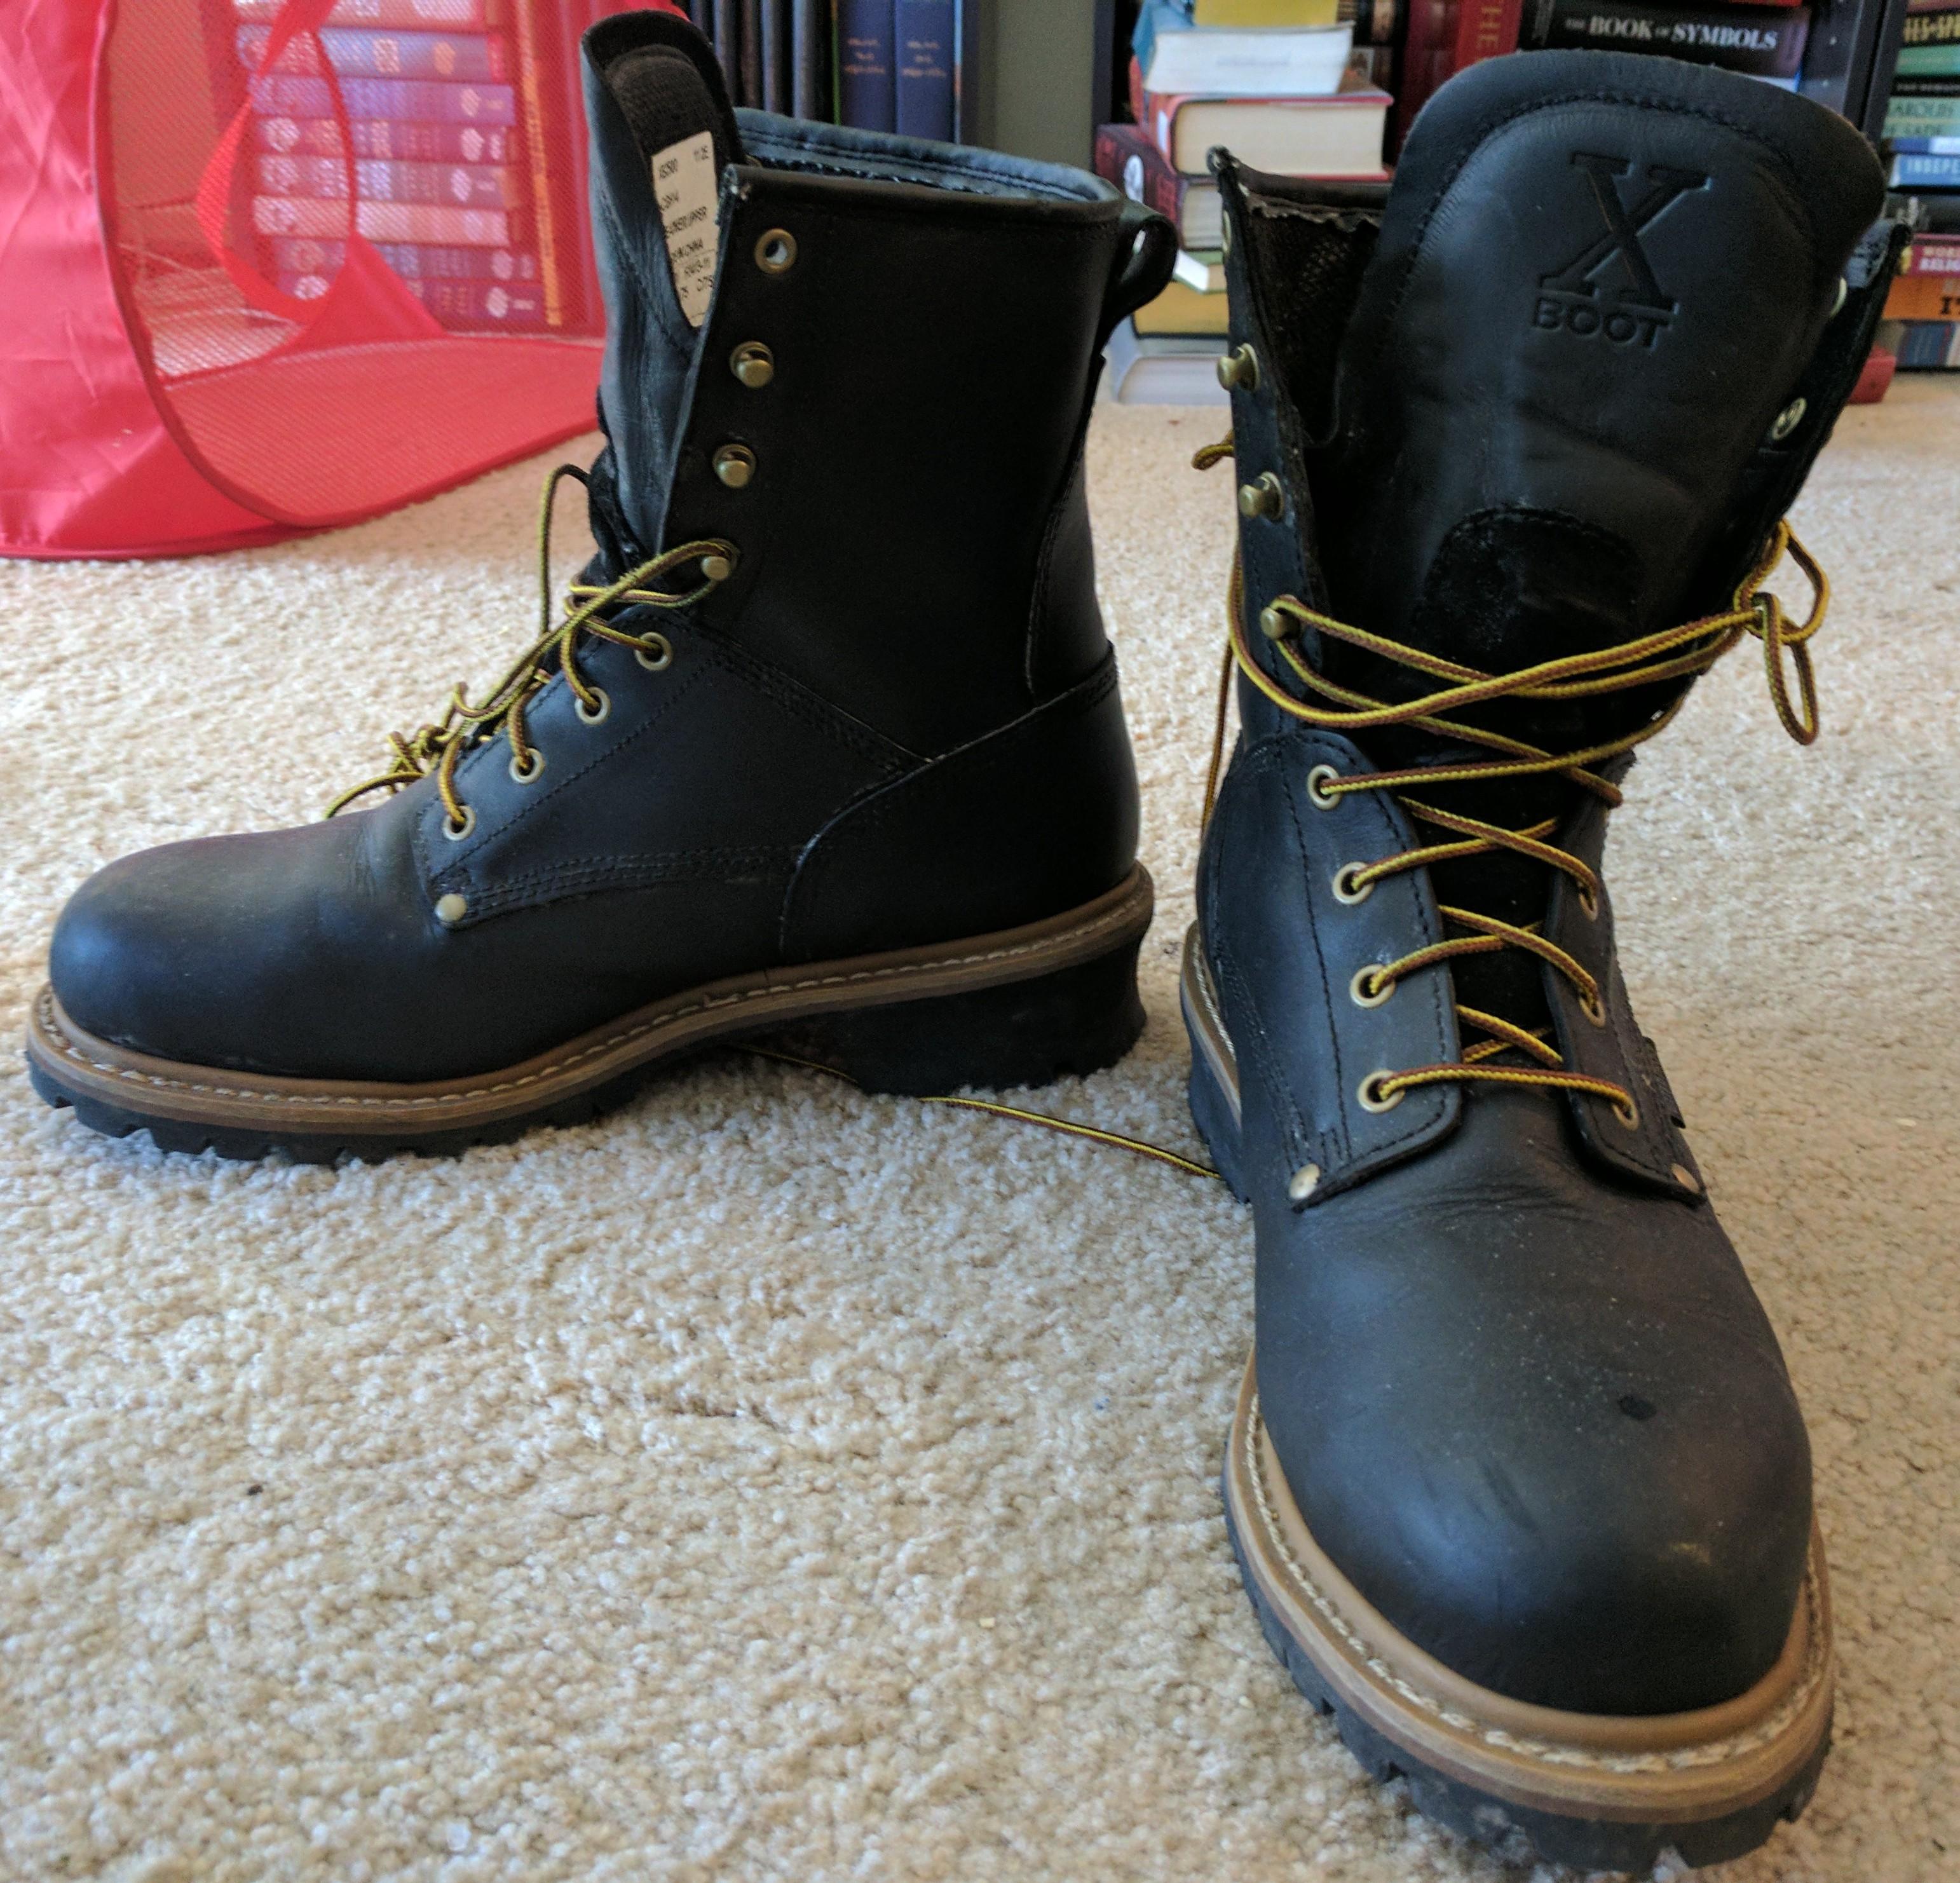 Caulk boots - Wikipedia